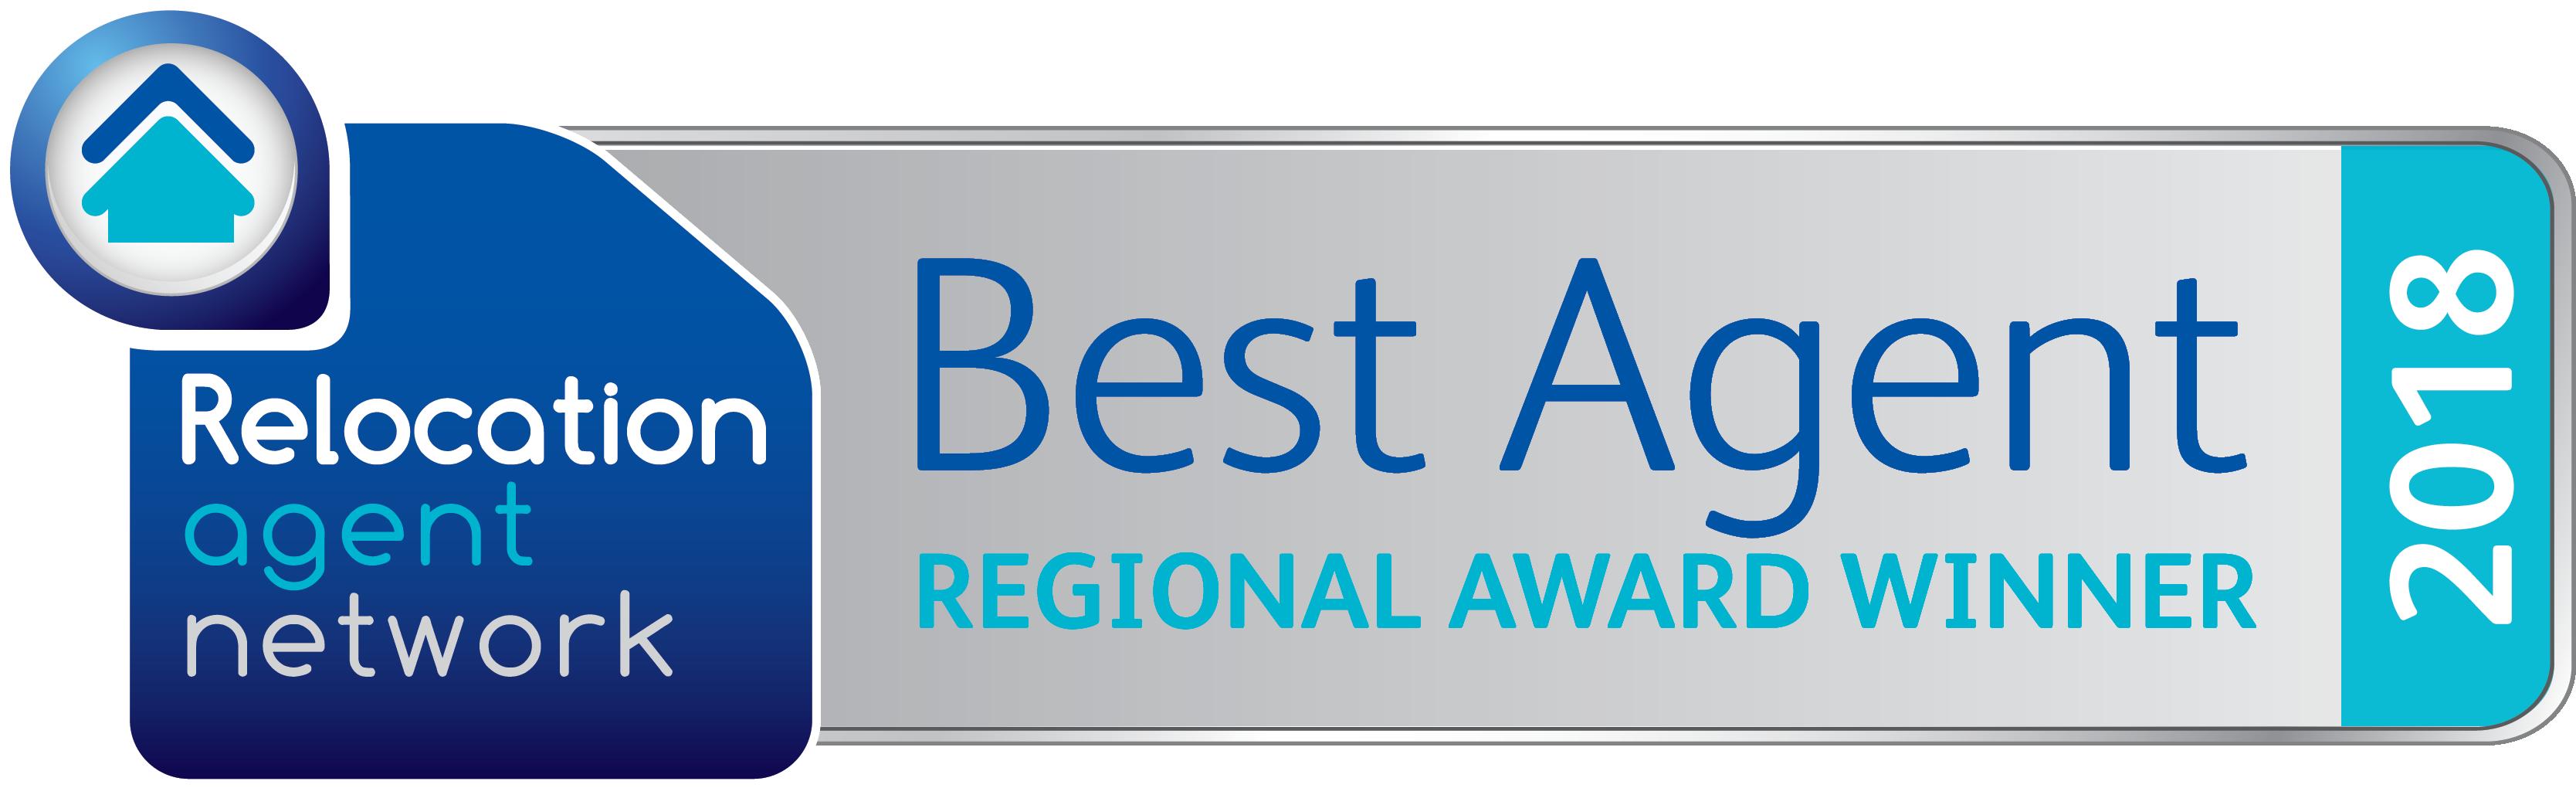 Relocation Agent Network Winner 2018